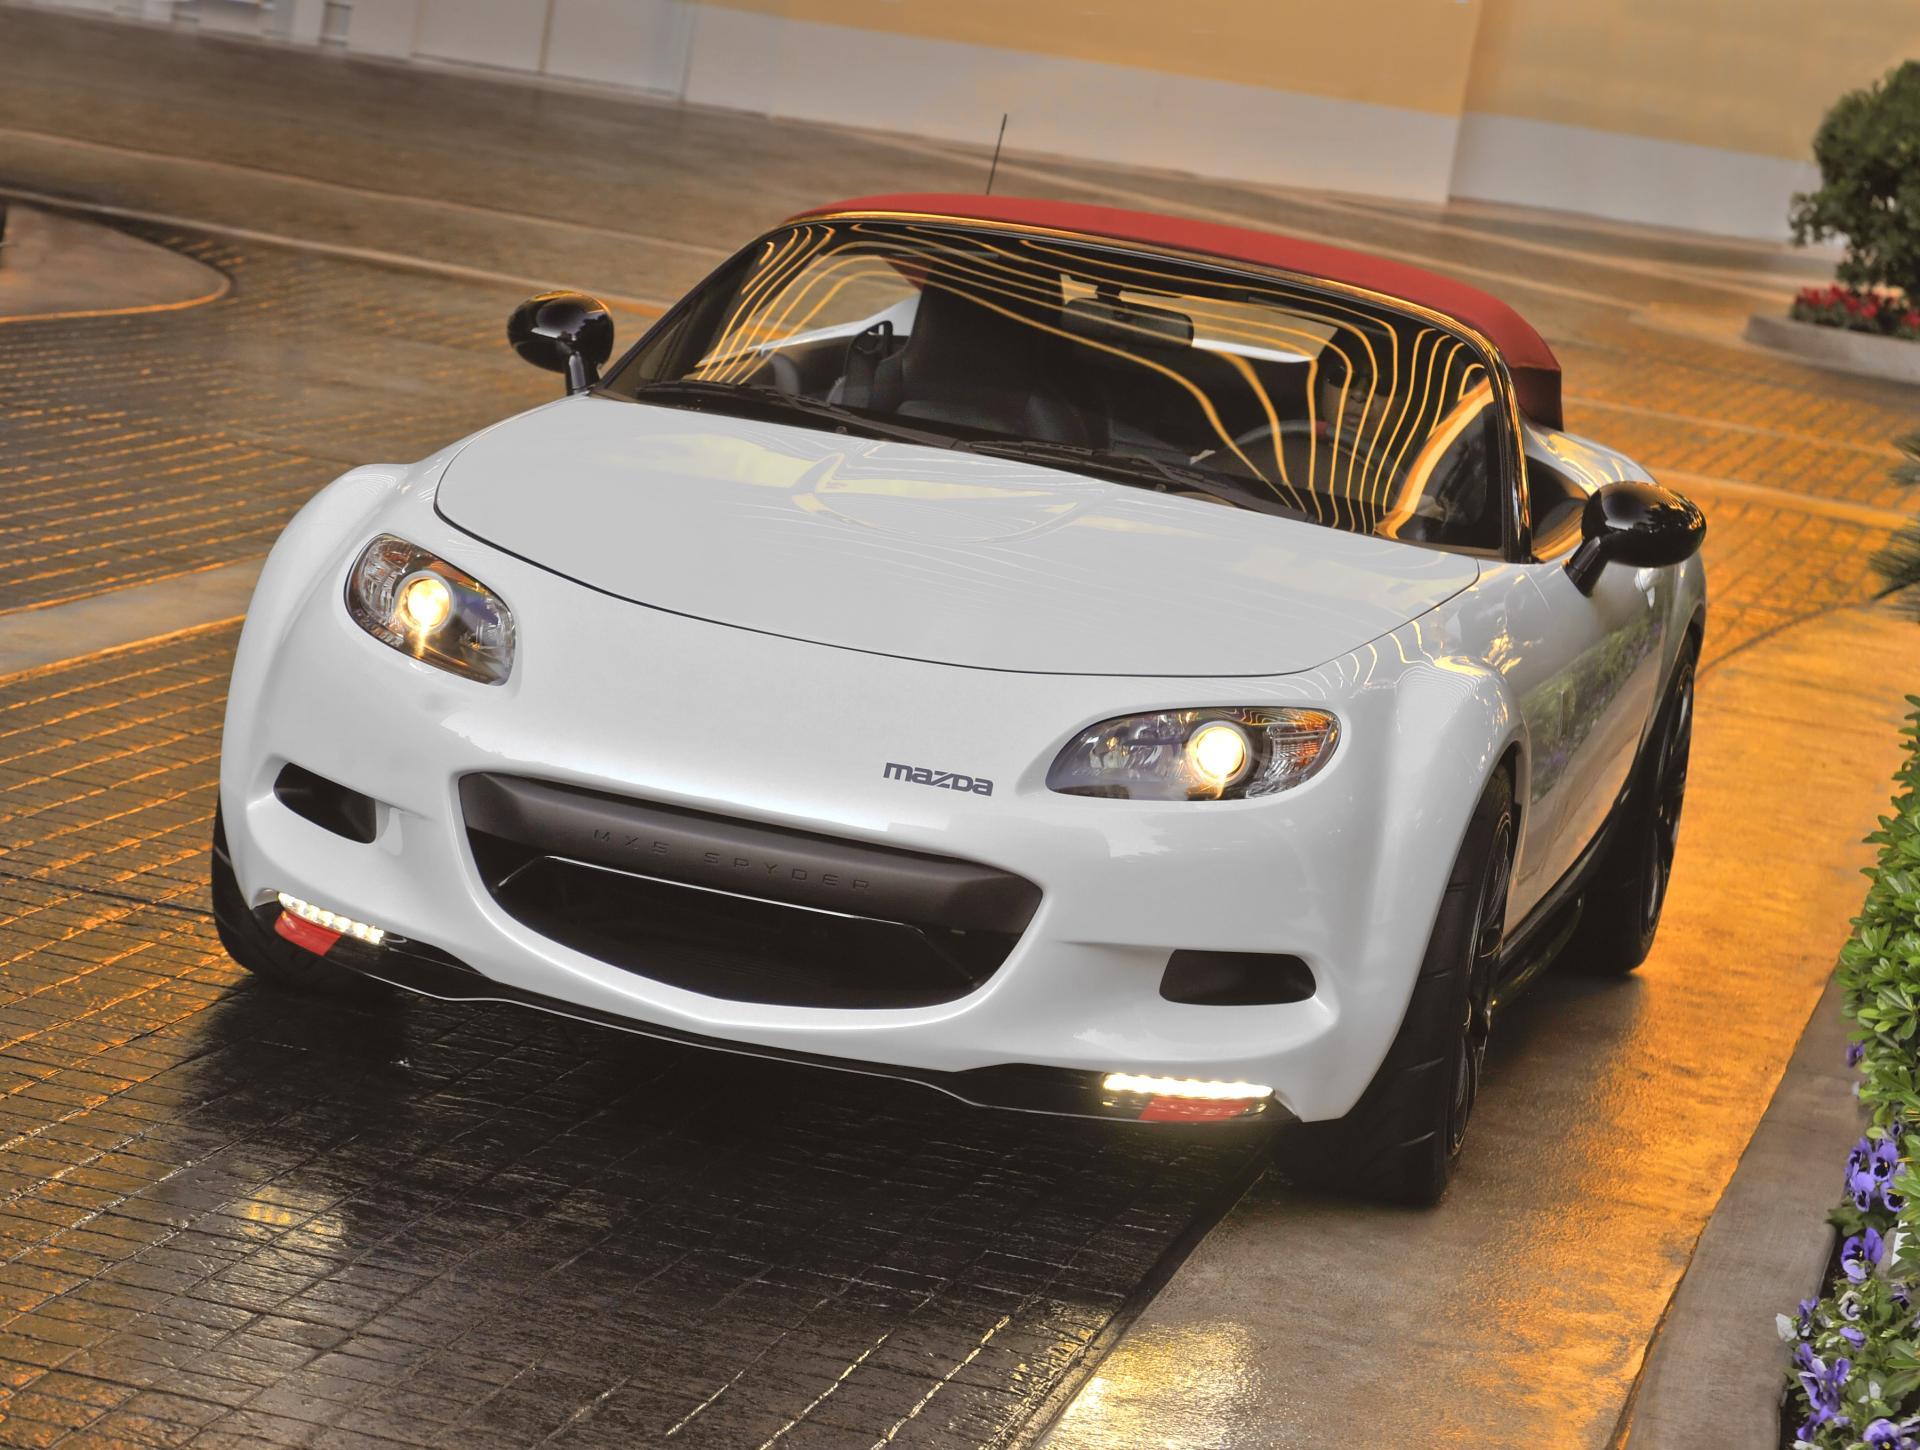 https://www.conceptcarz.com/images/Mazda/Mazda-MX-5_Spyder-2012-01.jpg